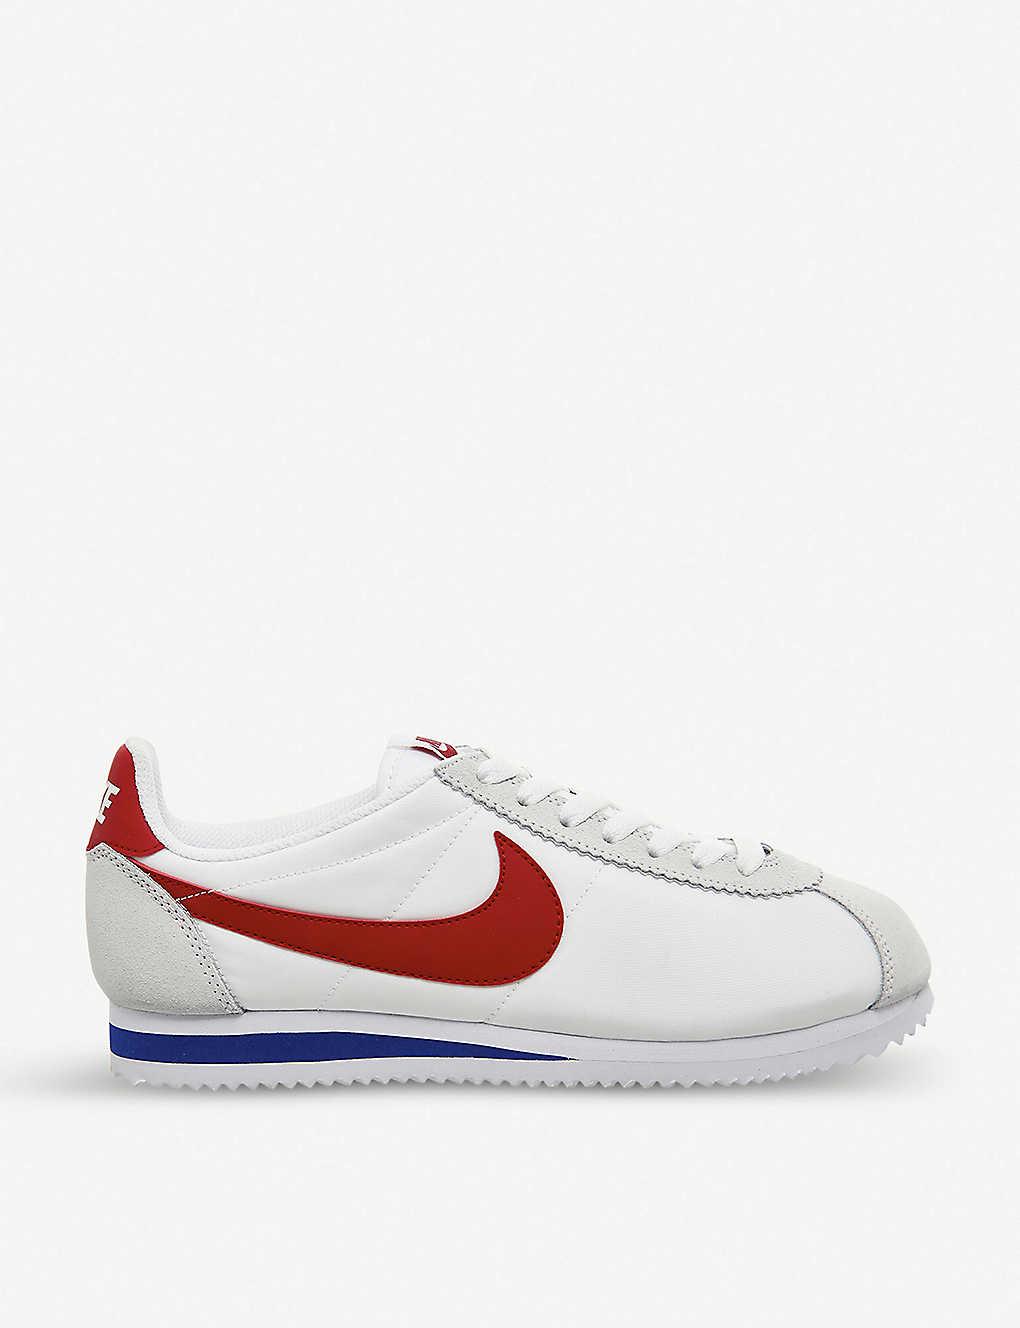 sports shoes 803ae 87eb8 NIKE - Cortez suede and nylon trainers | Selfridges.com